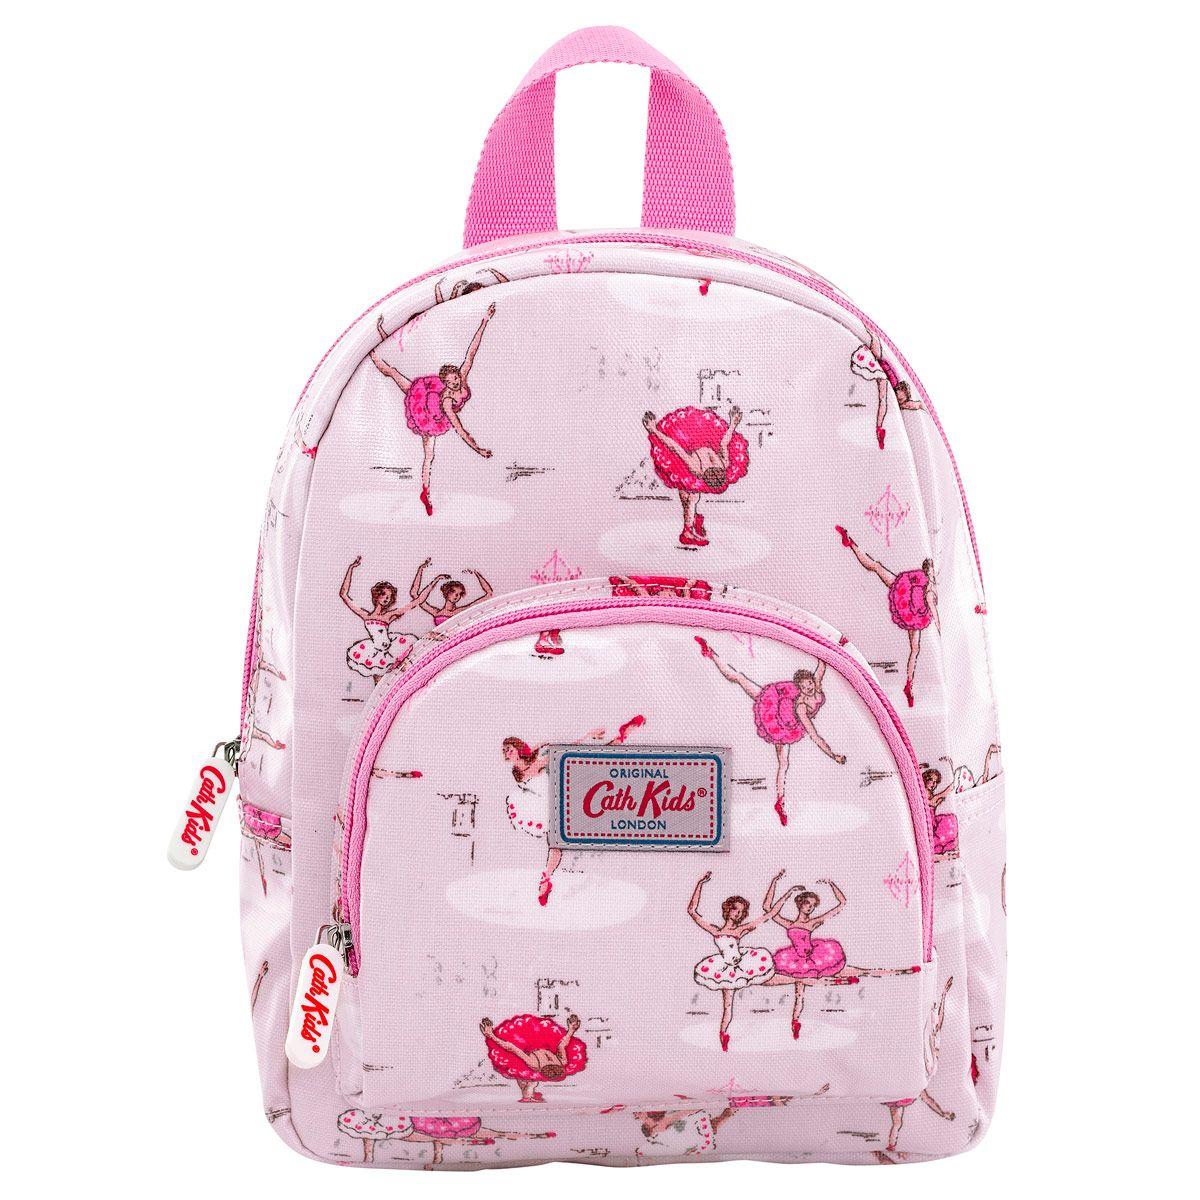 Ballerina Mini Rucksack For Kids Cath Kidston Accessories For